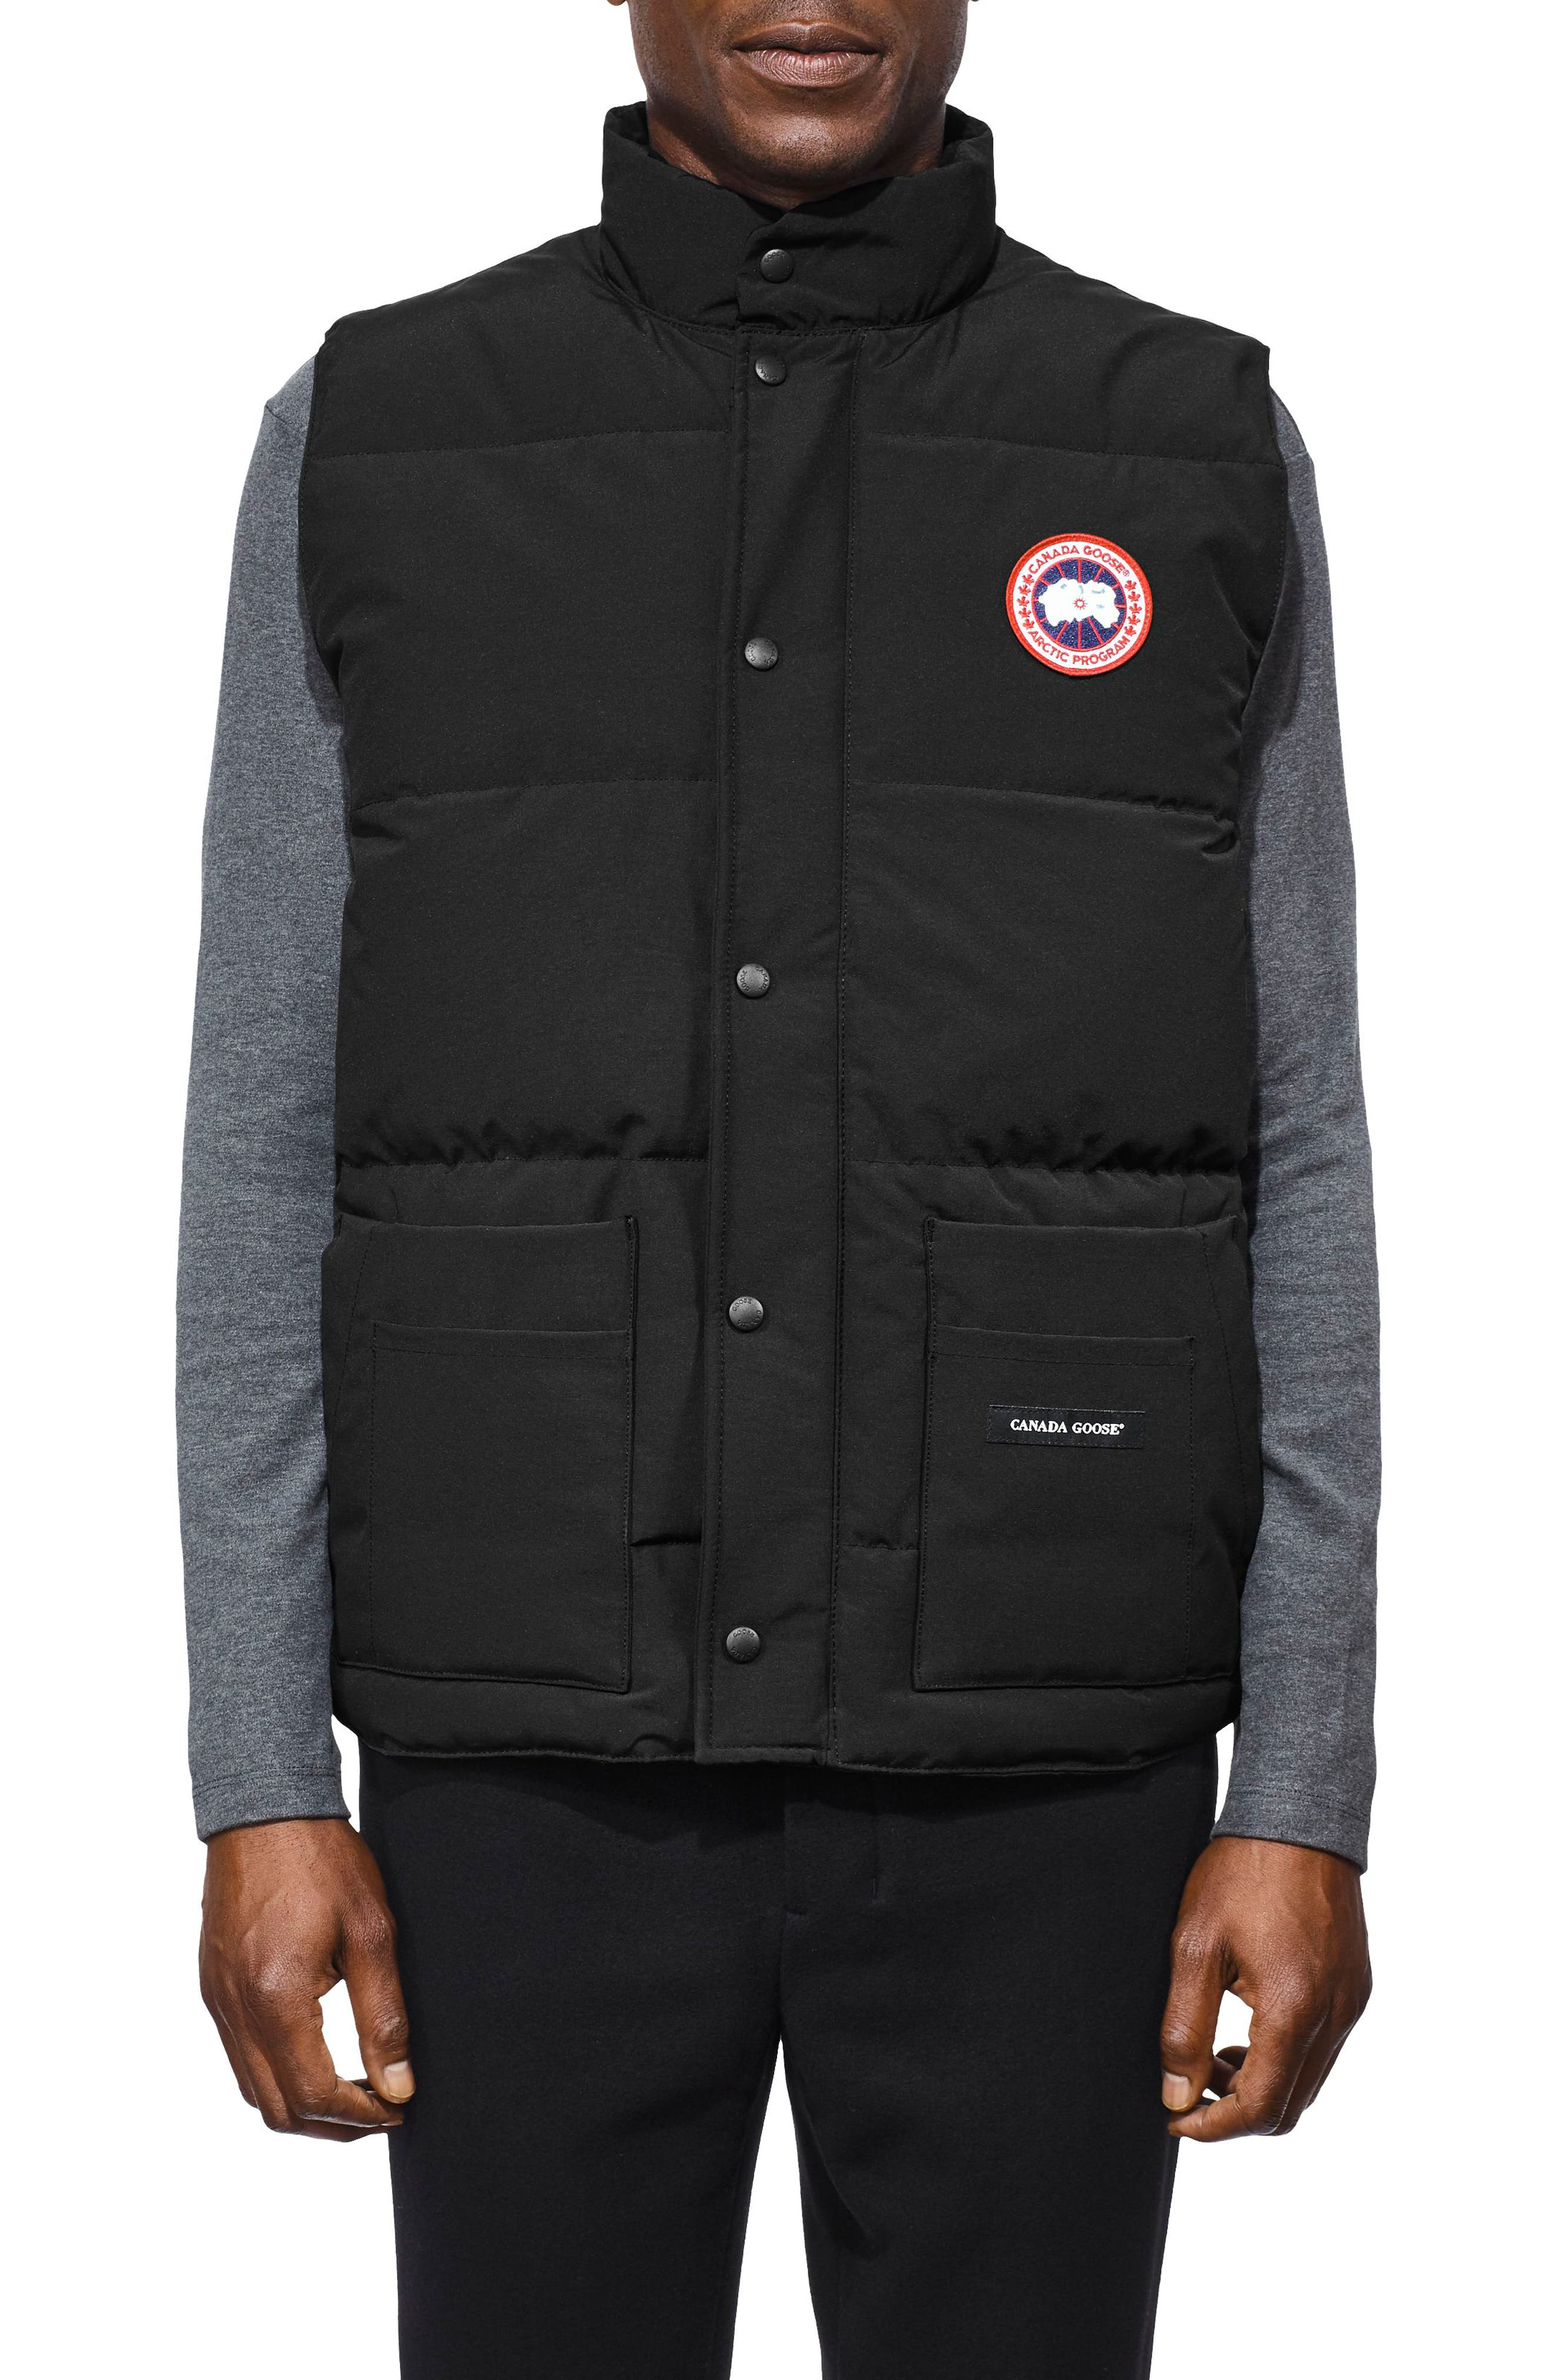 Canada Goose Freestyle Regular Fit Down Vest, Black